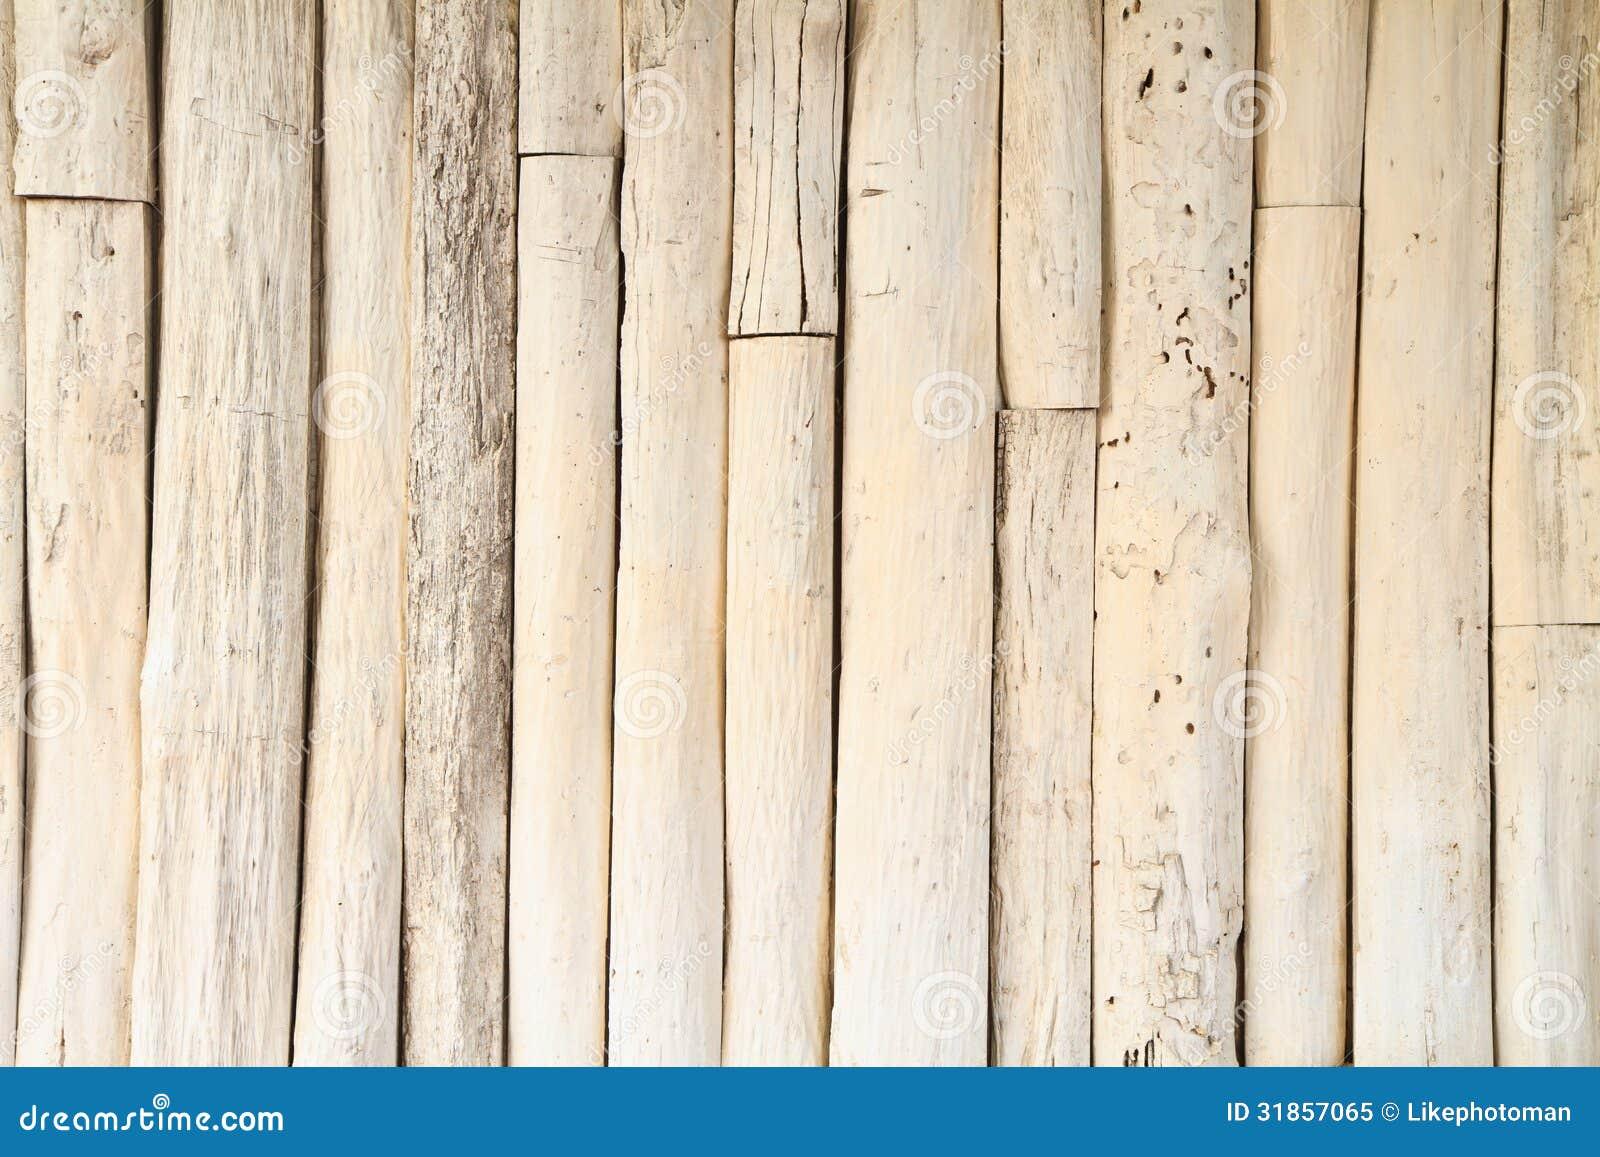 Pared de madera vieja imagen de archivo imagen de tarjeta - Revestir paredes con madera ...